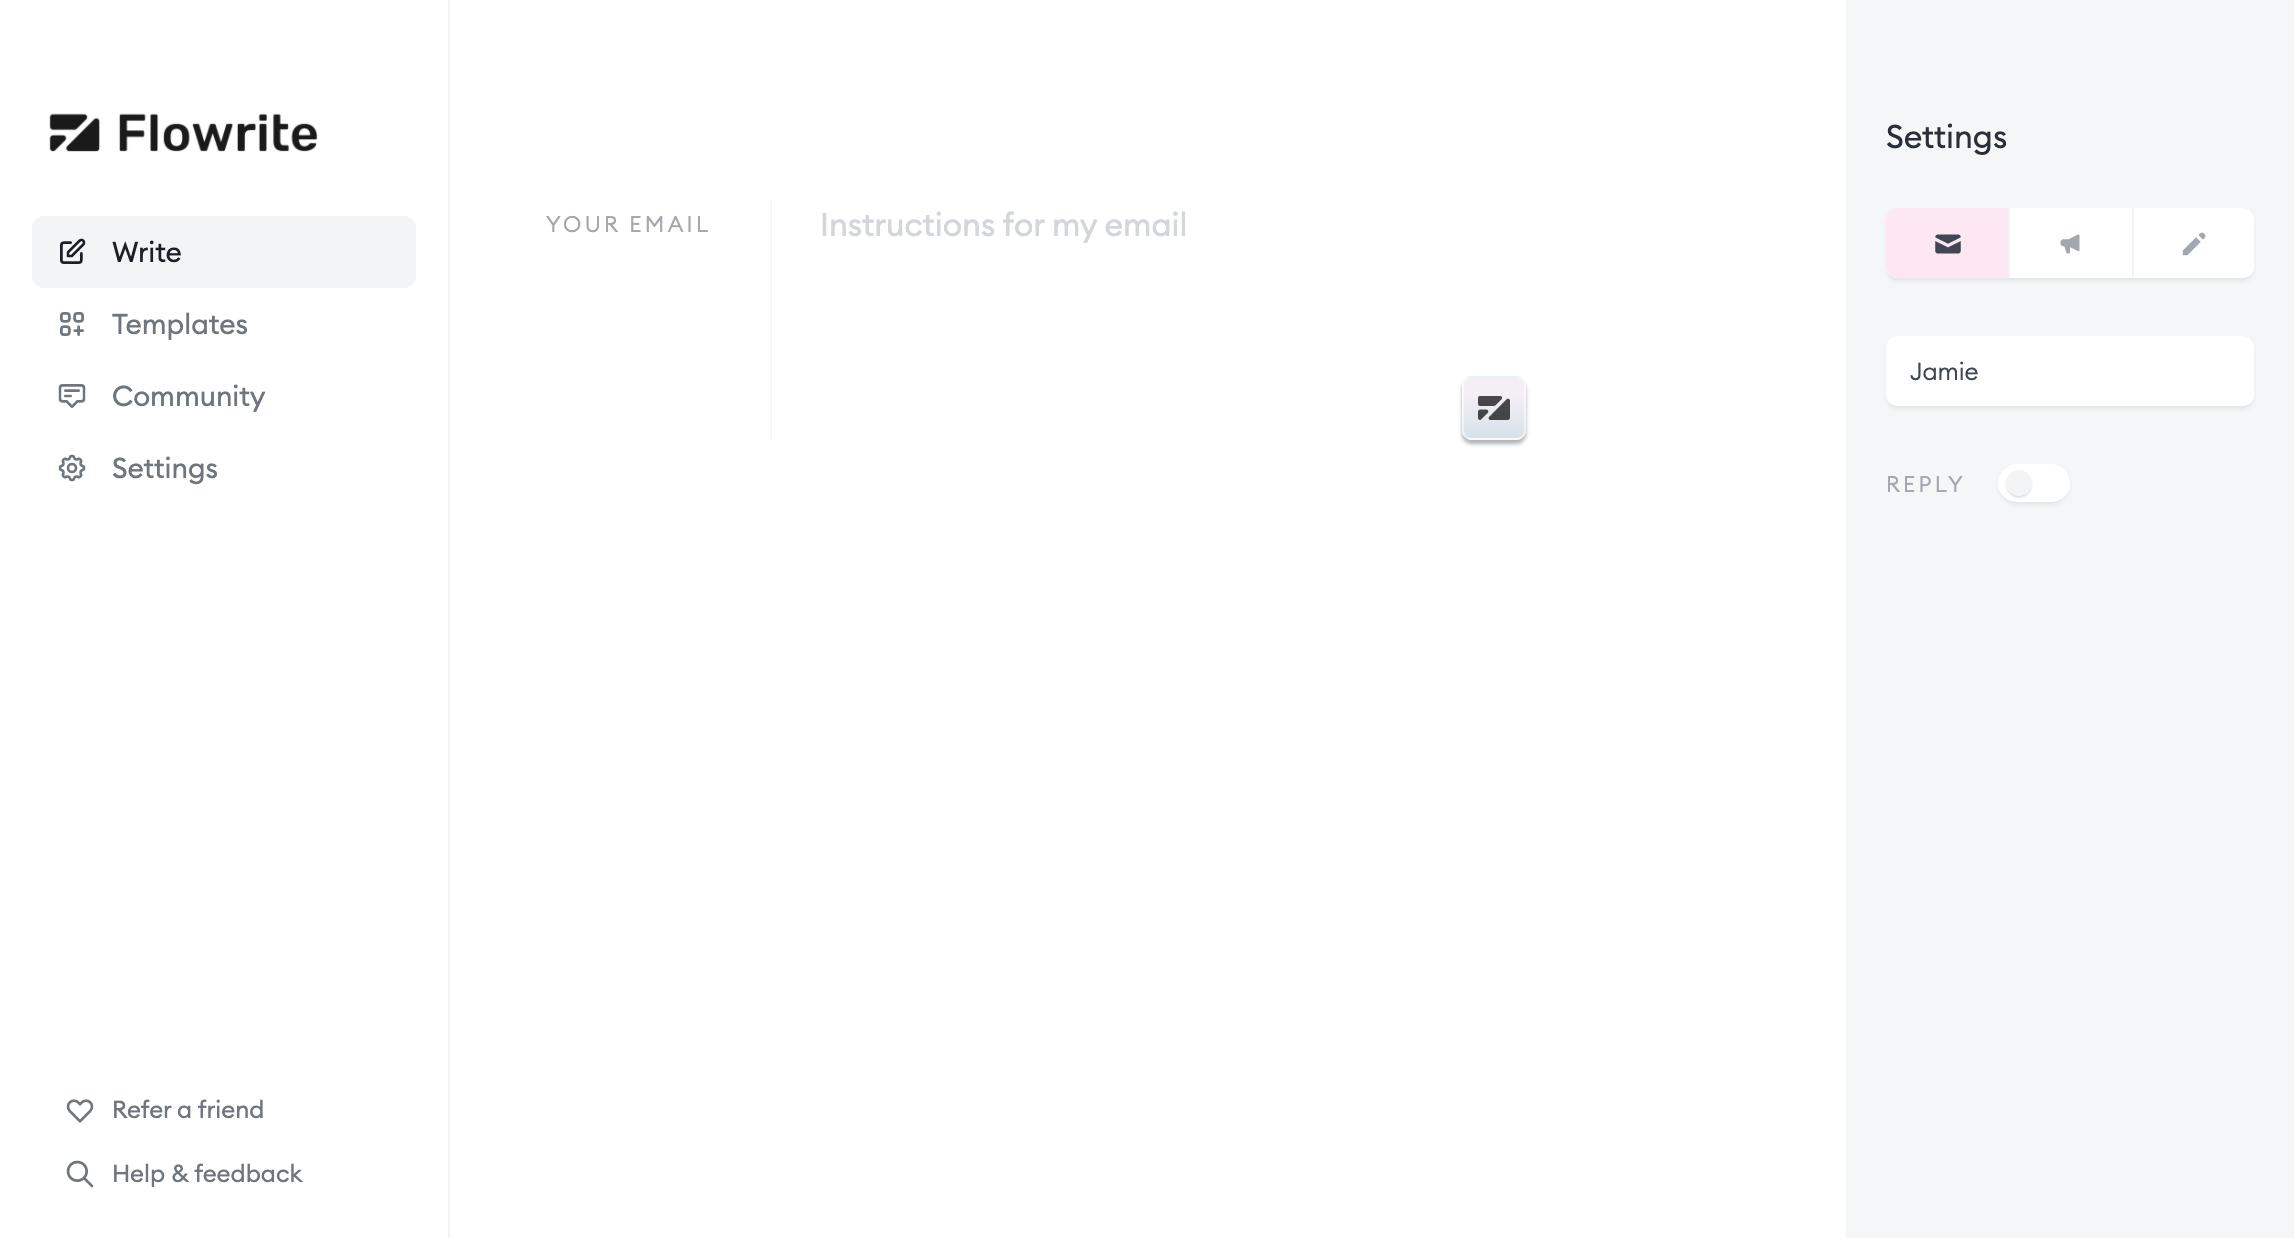 Flowrite user interface